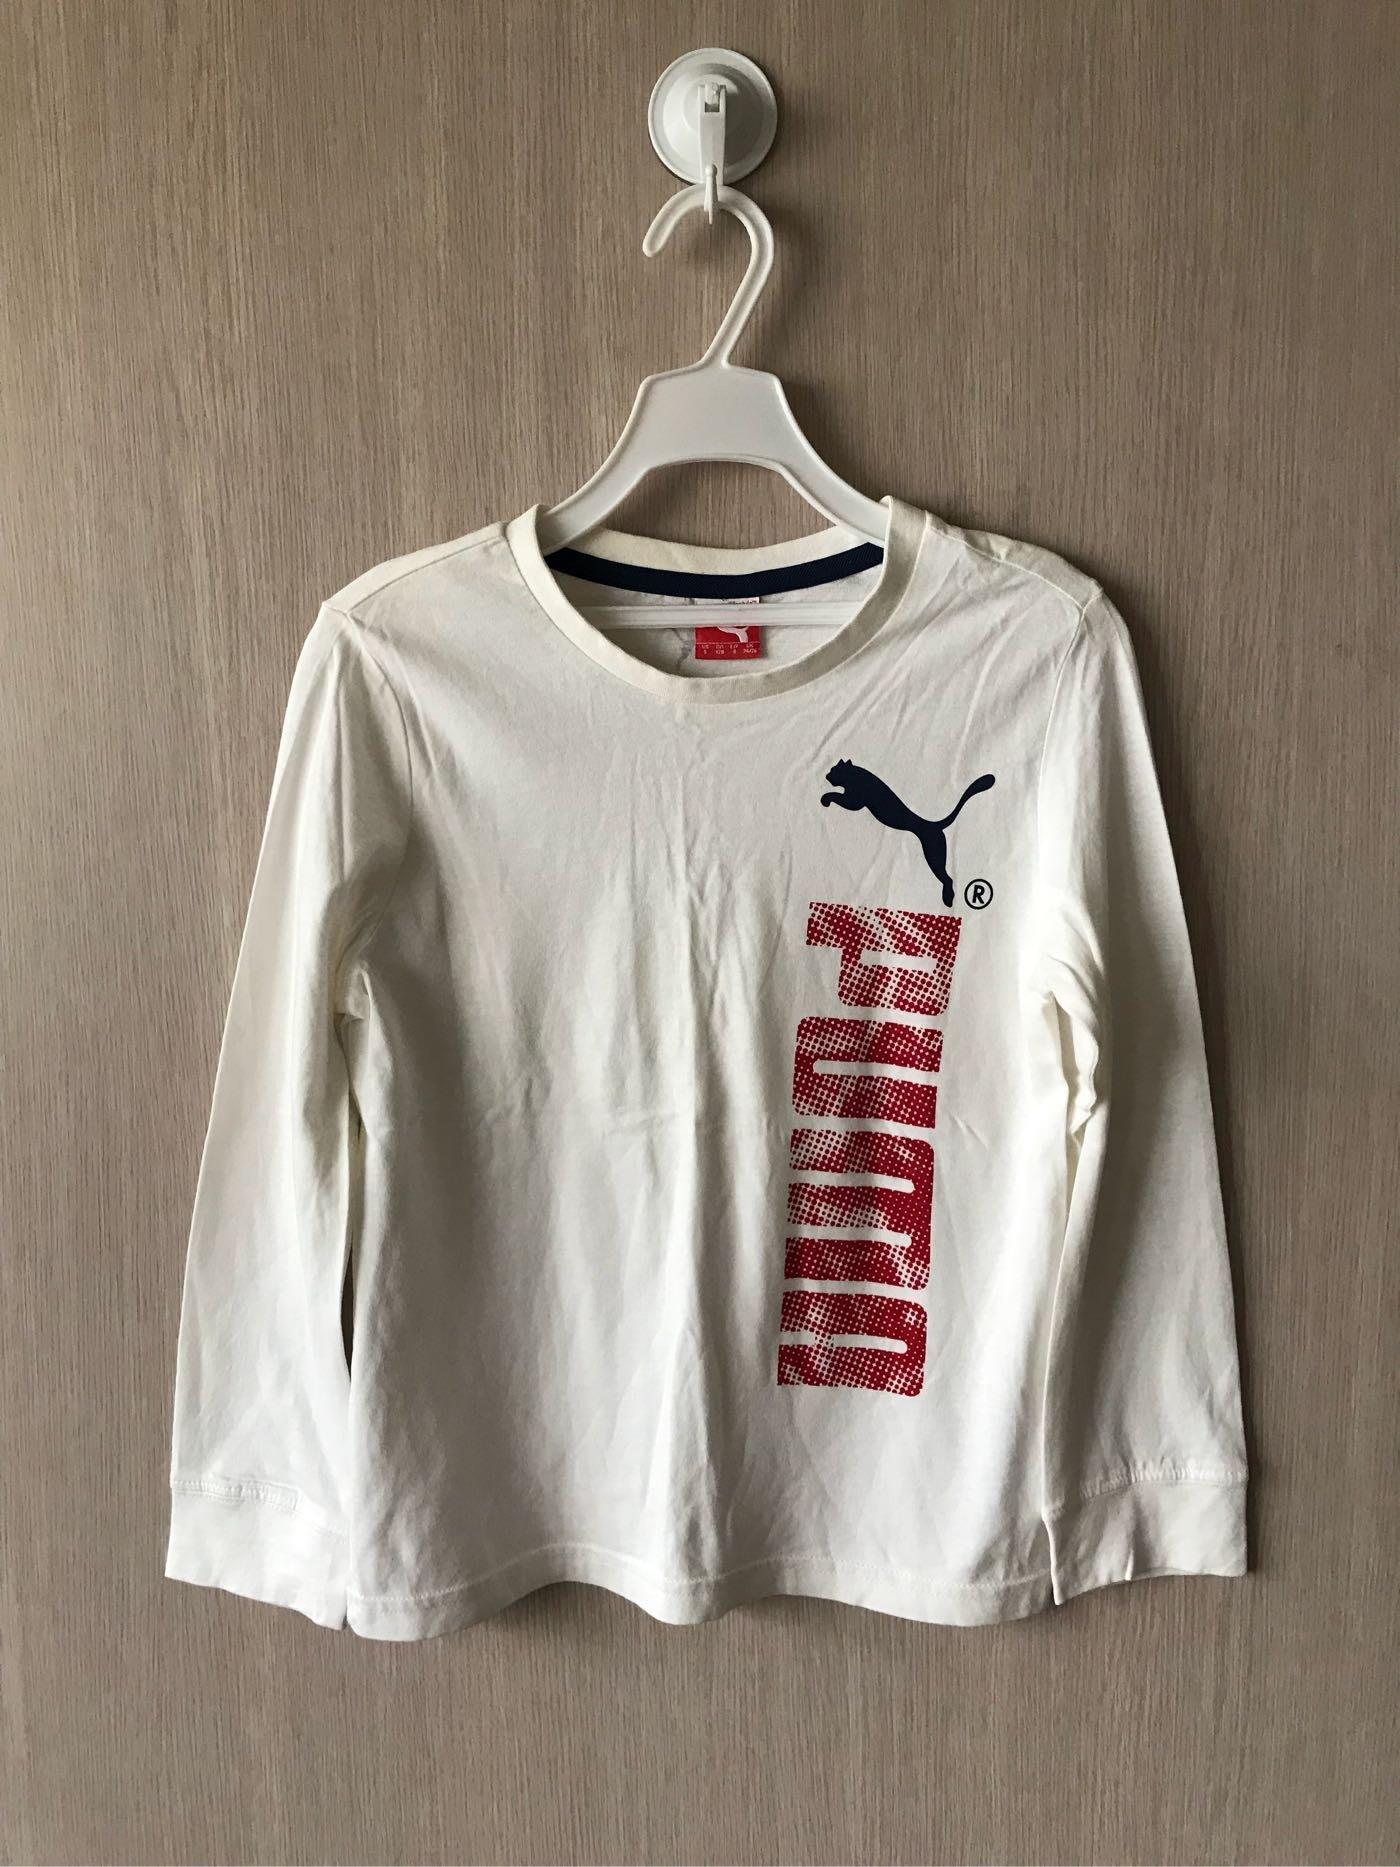 Puma 白色薄T